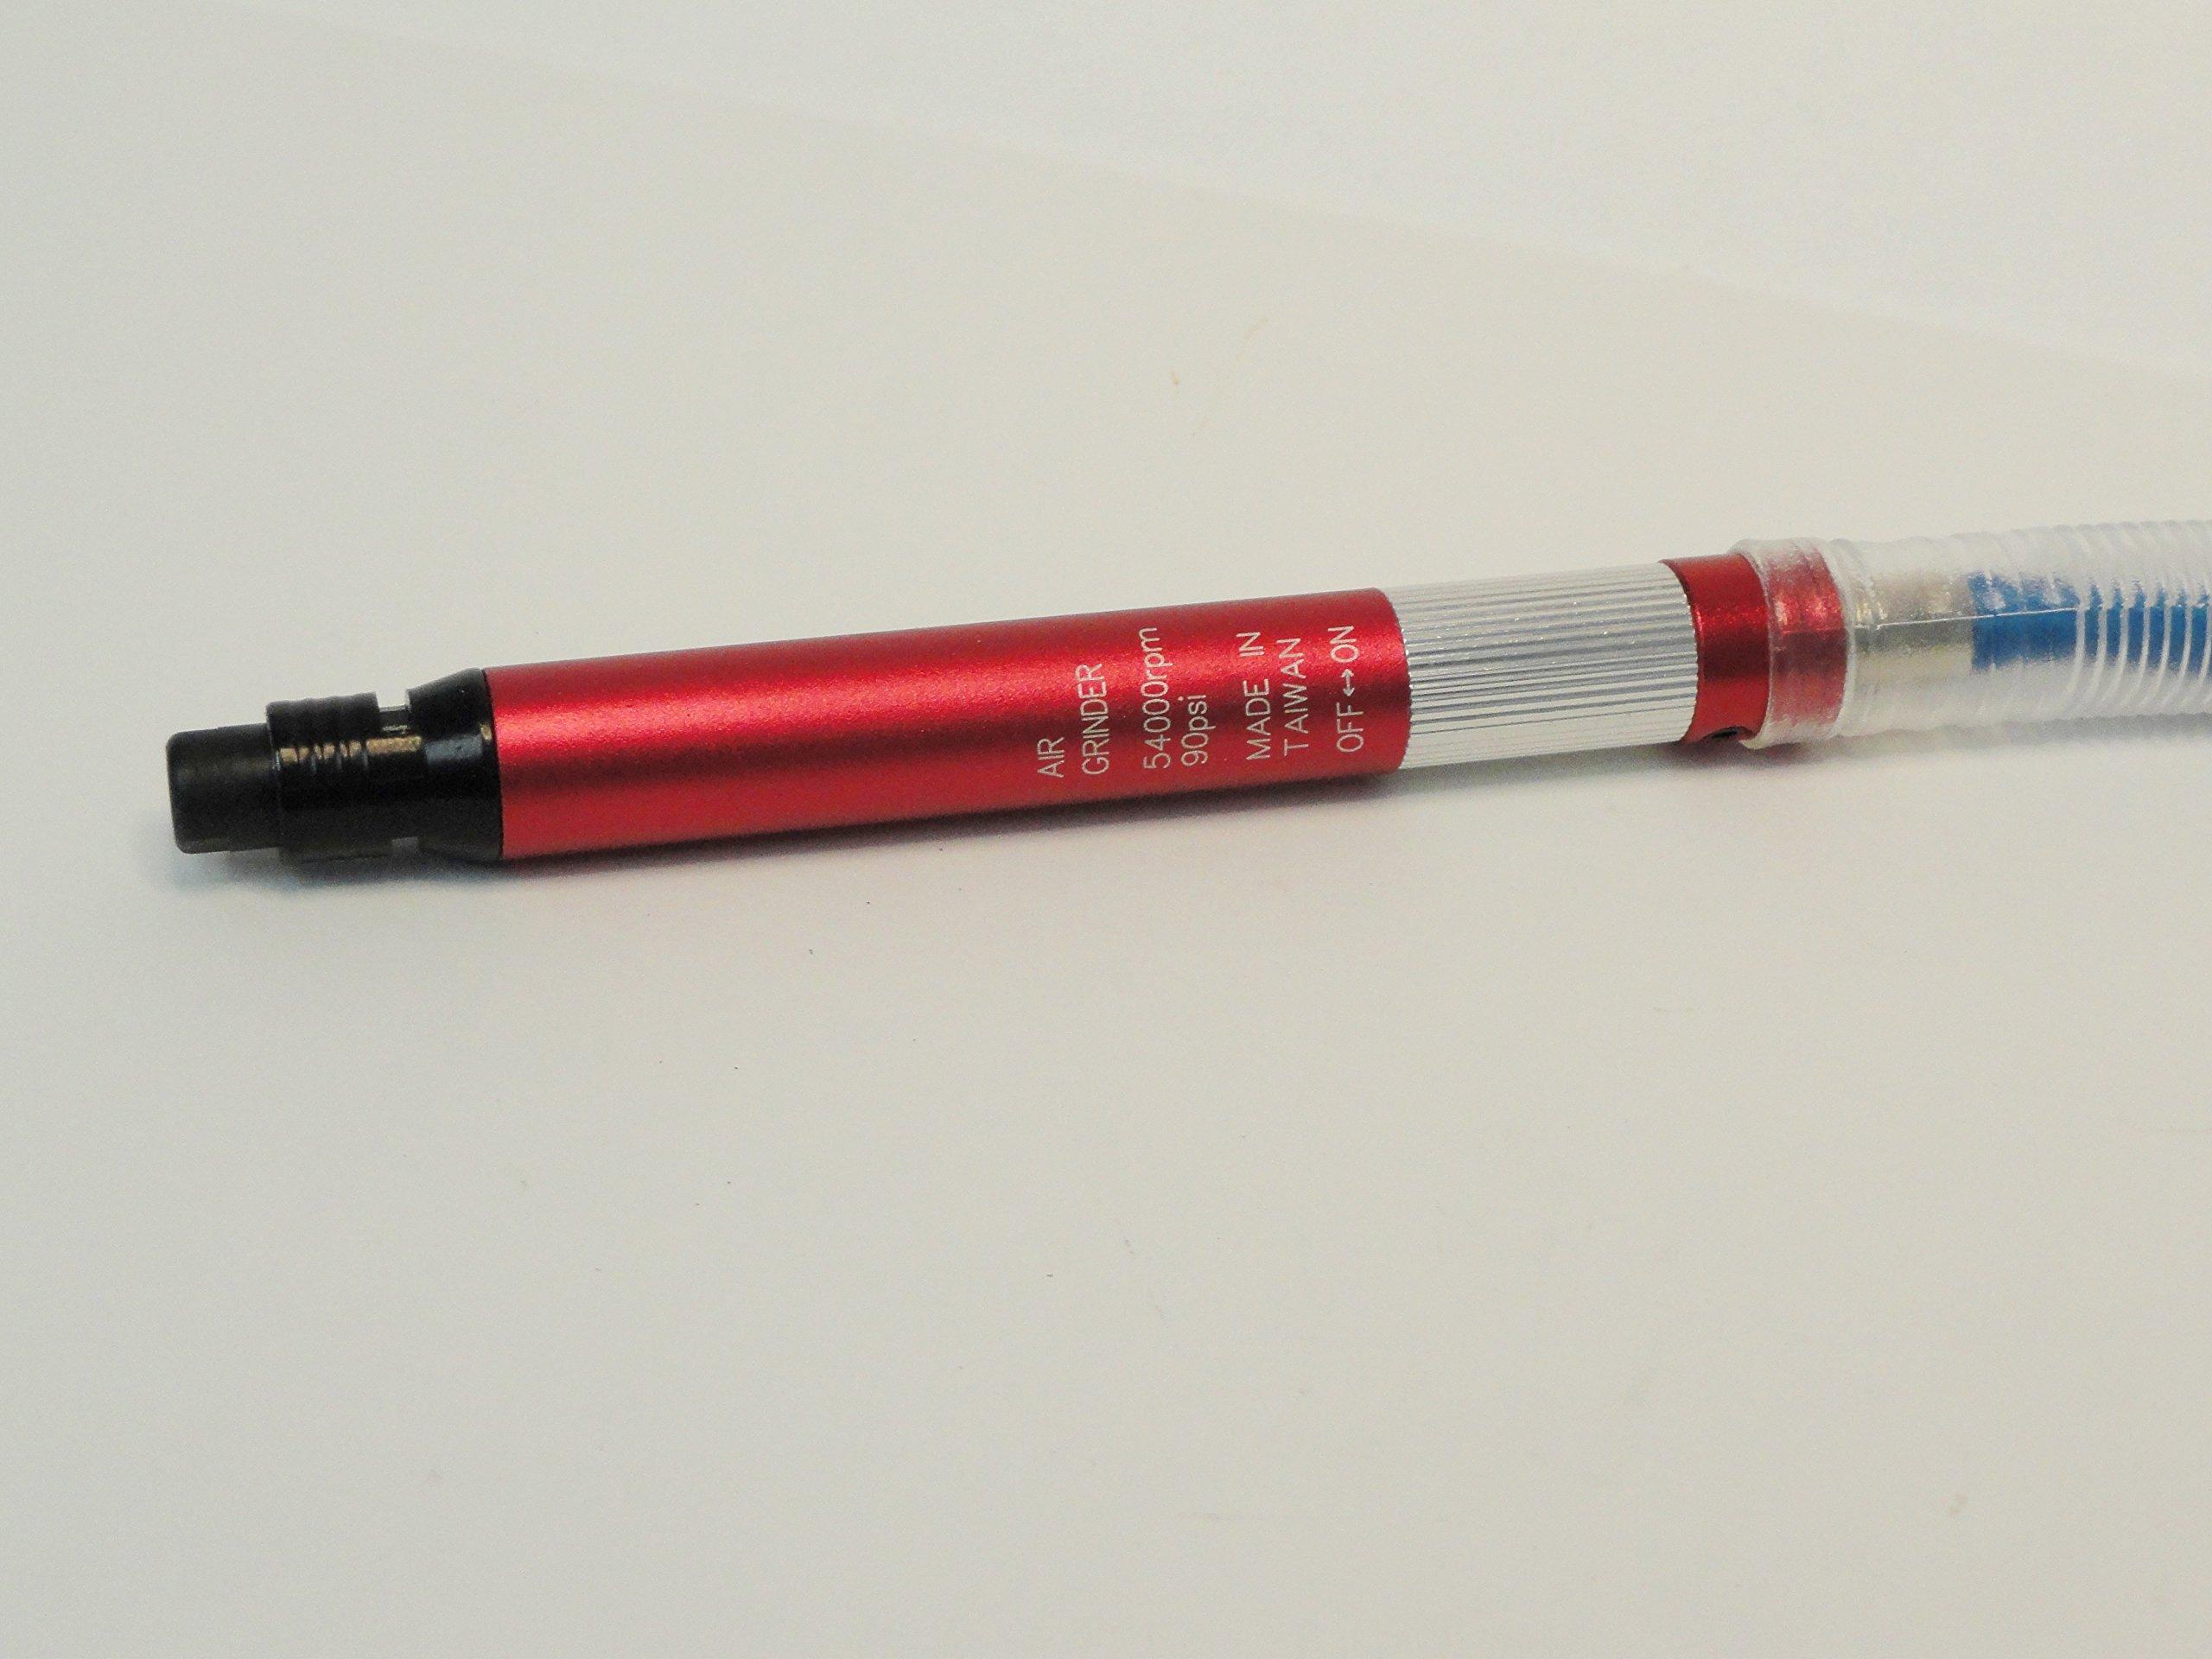 JW-101 Micro pencil Grinder